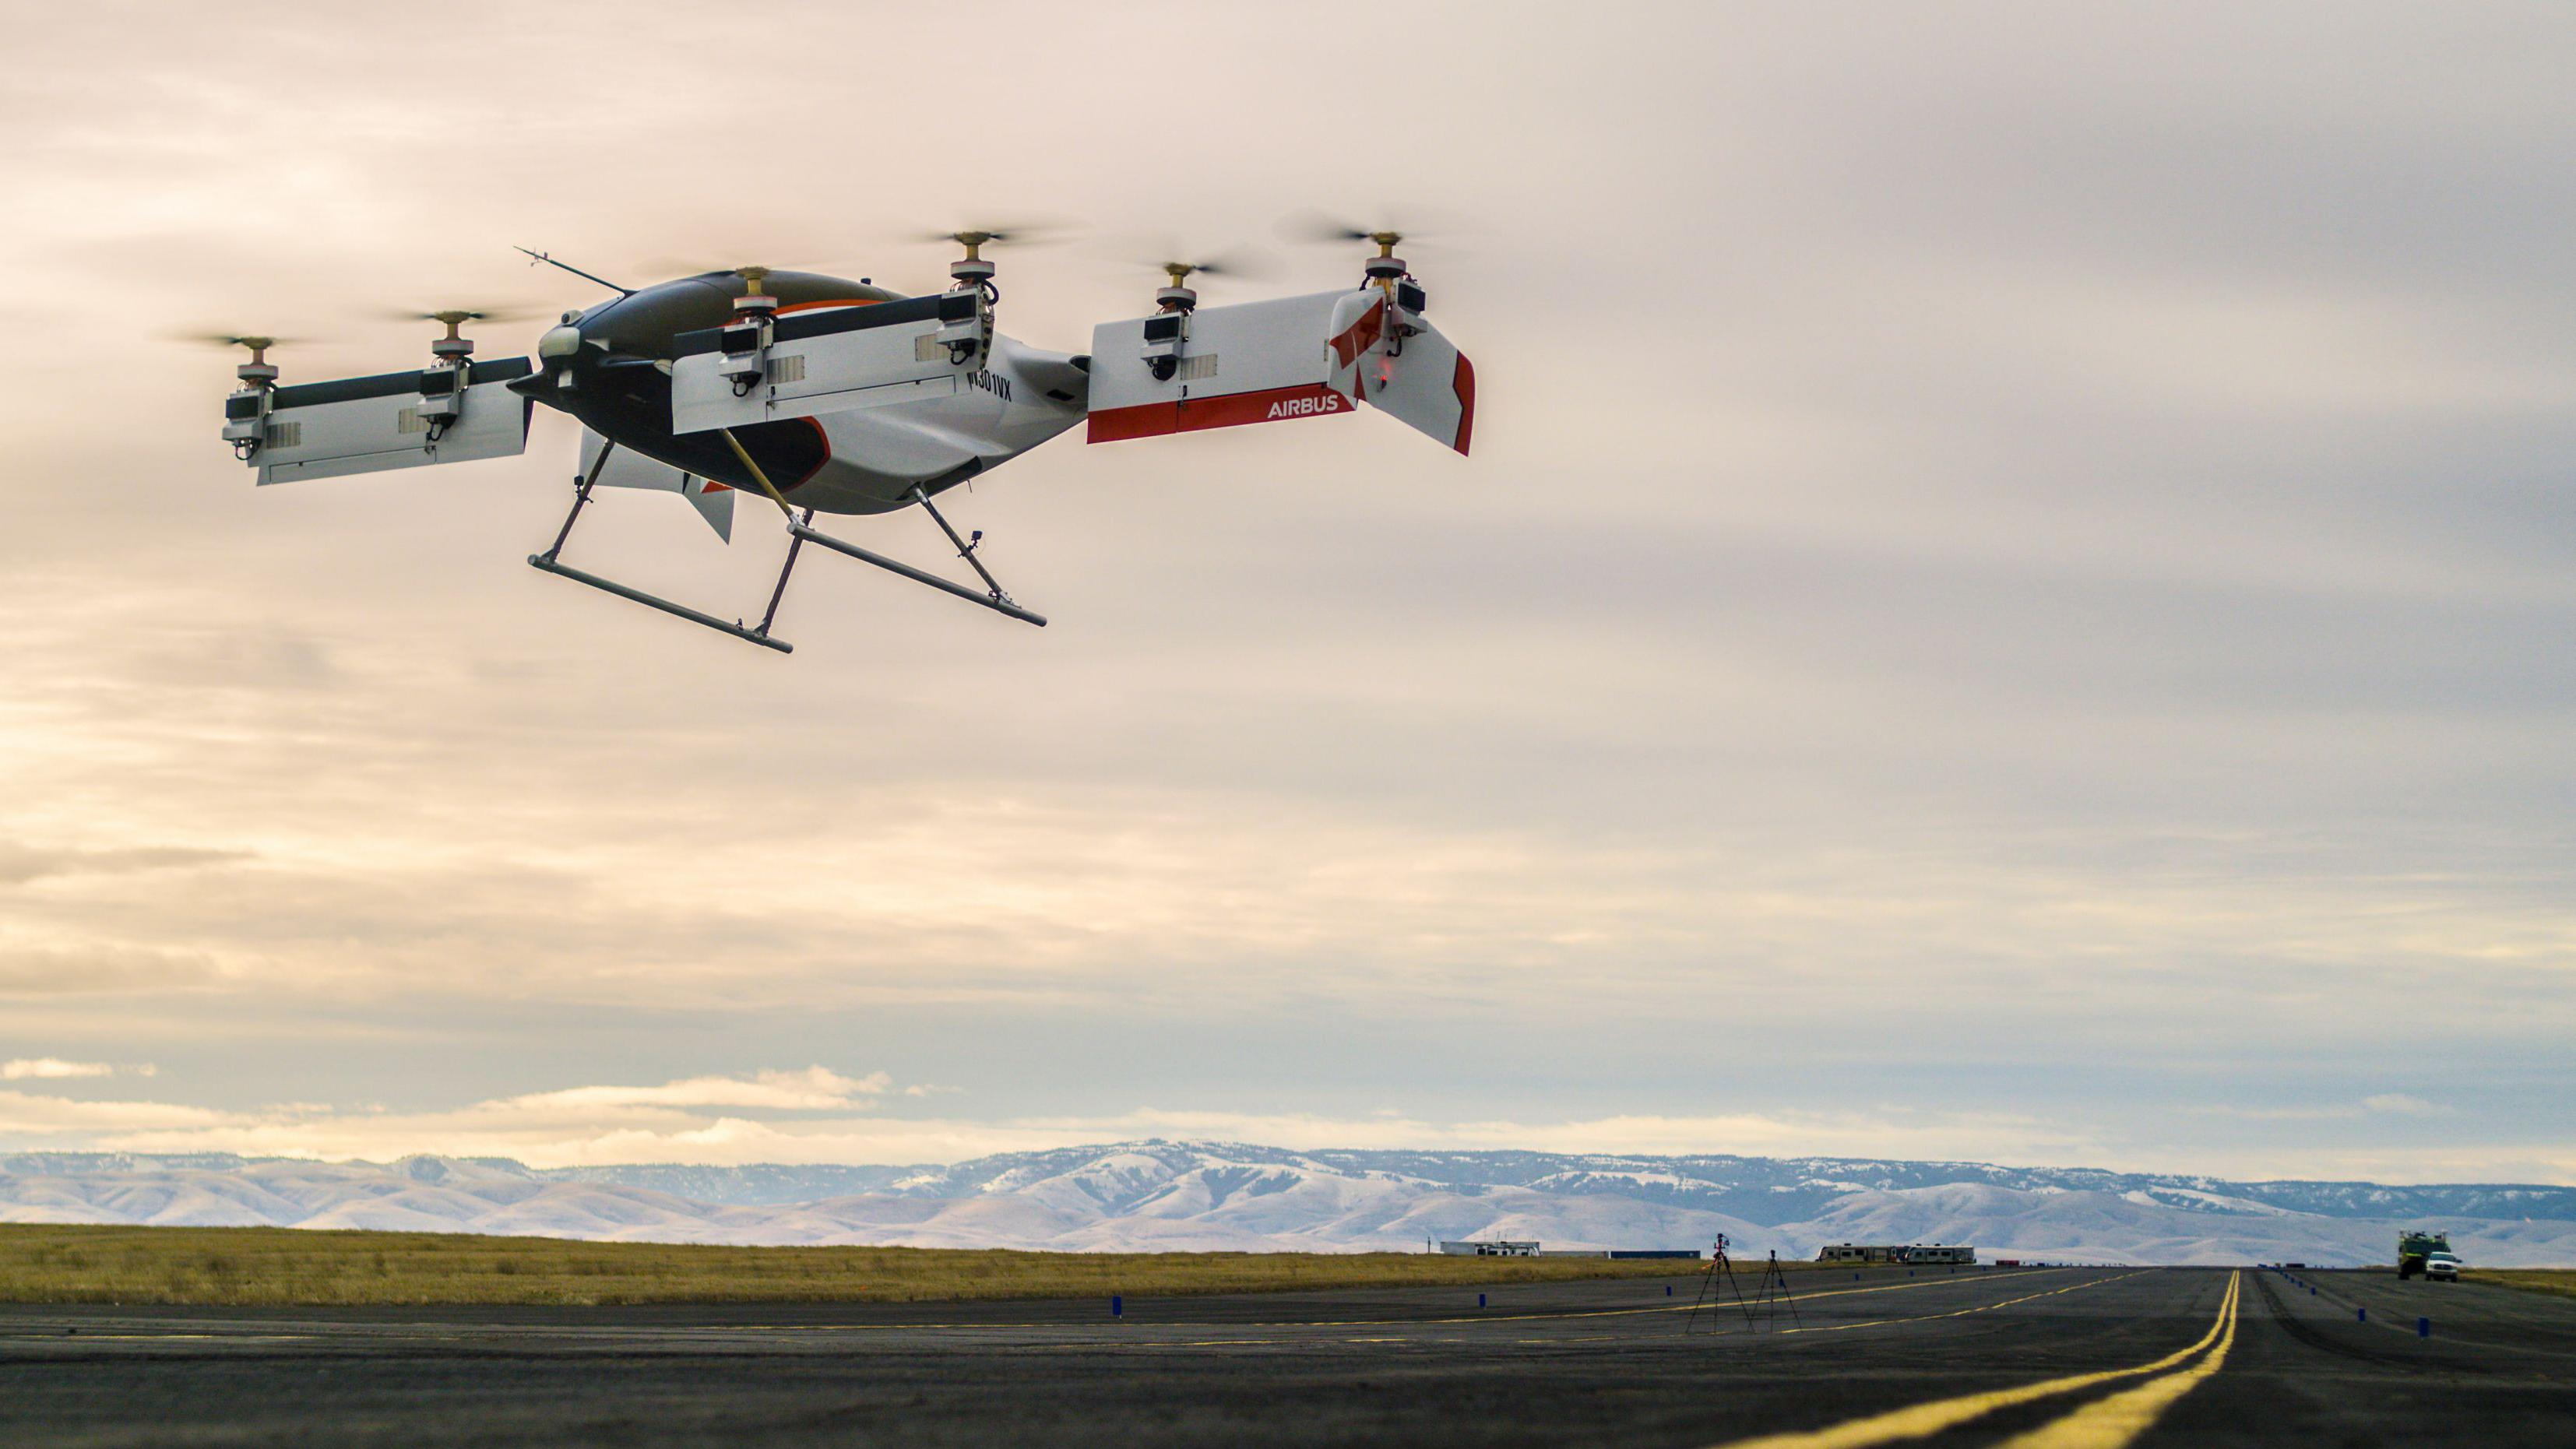 Airbus A3 Vahana autonomous electric aircraft